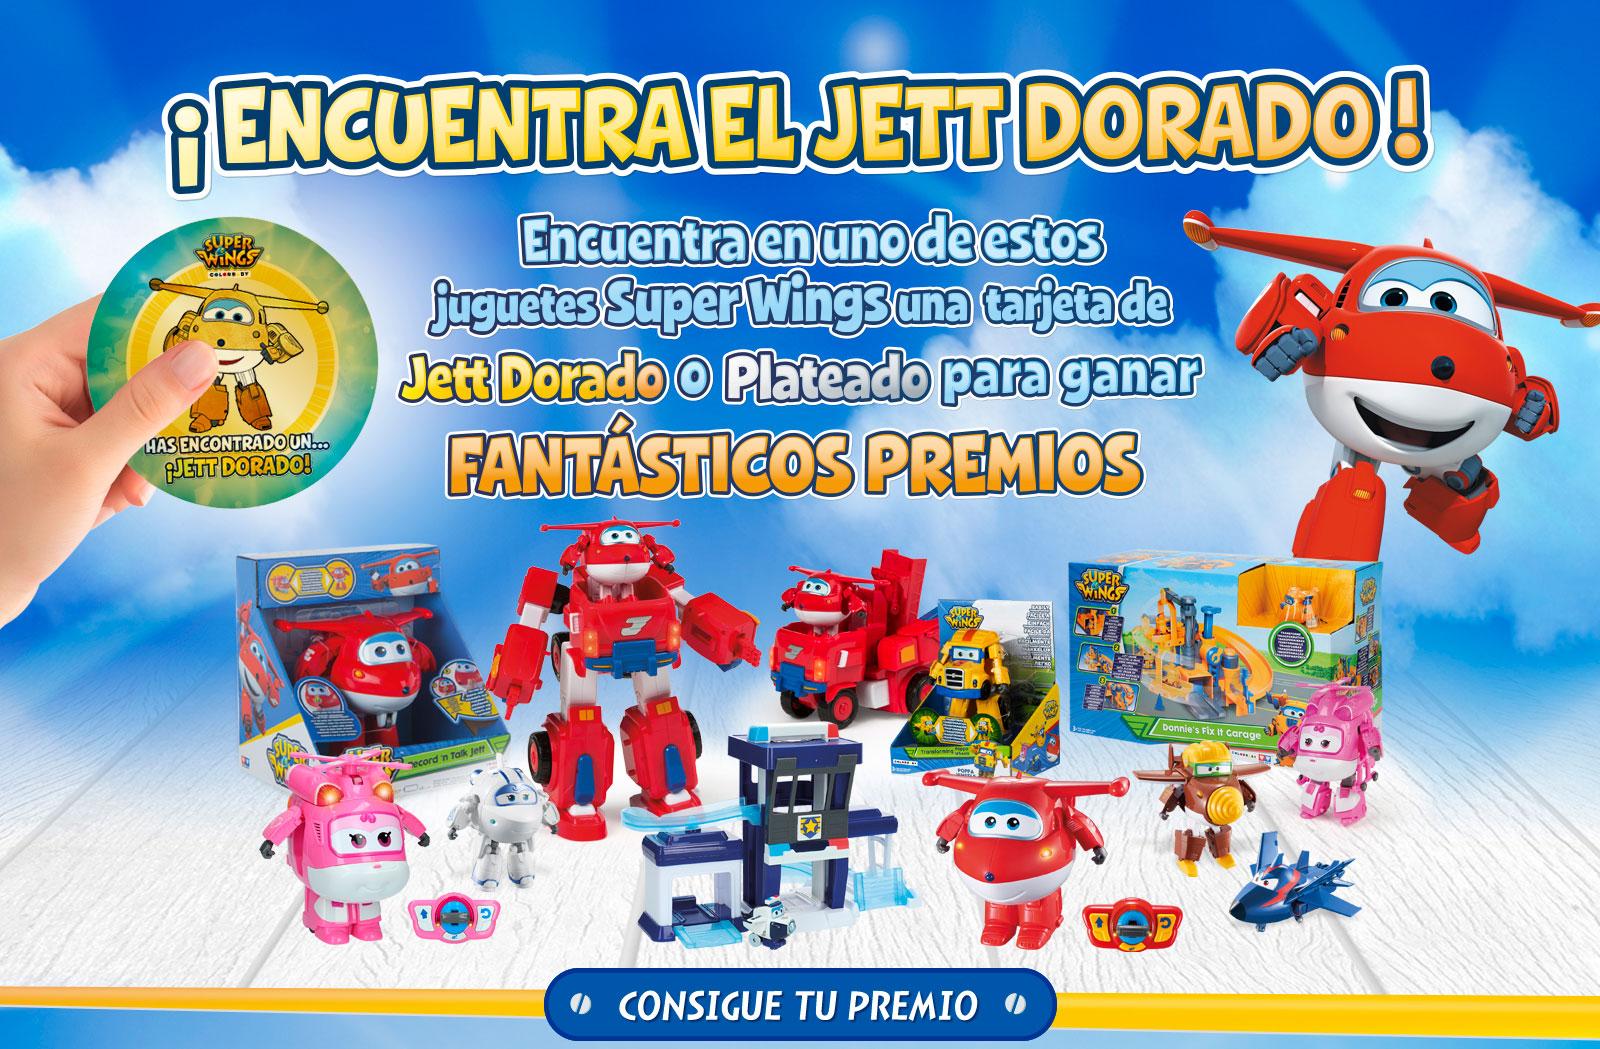 Concurso Jett Dorado Super Wings